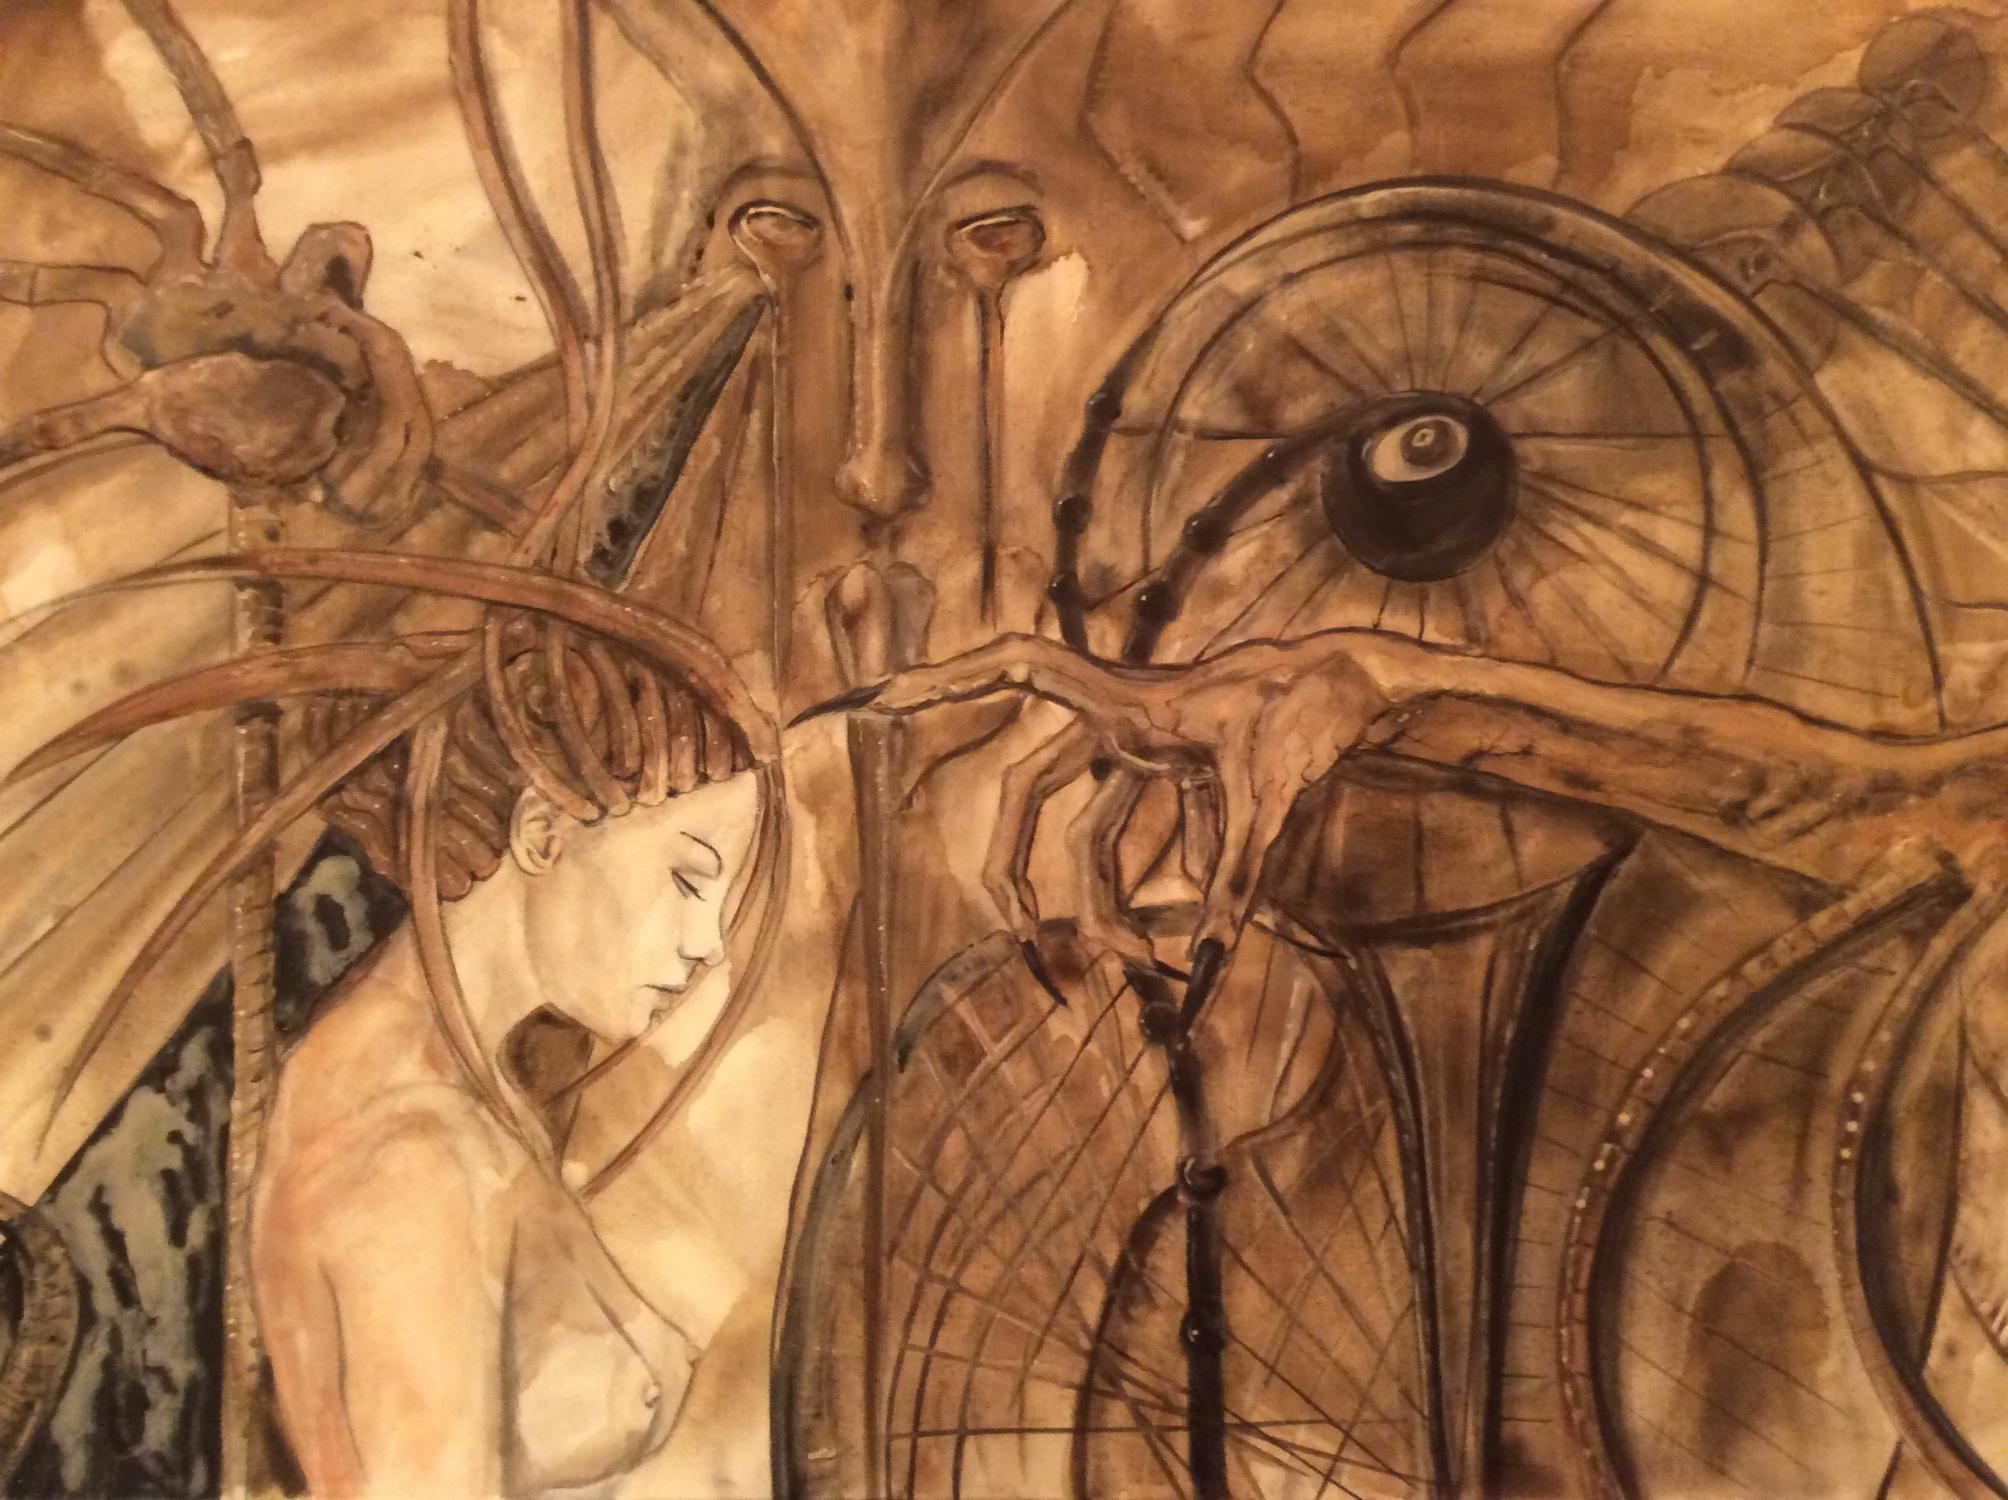 Chosen by Shadow Artwork by Jeremy Neill